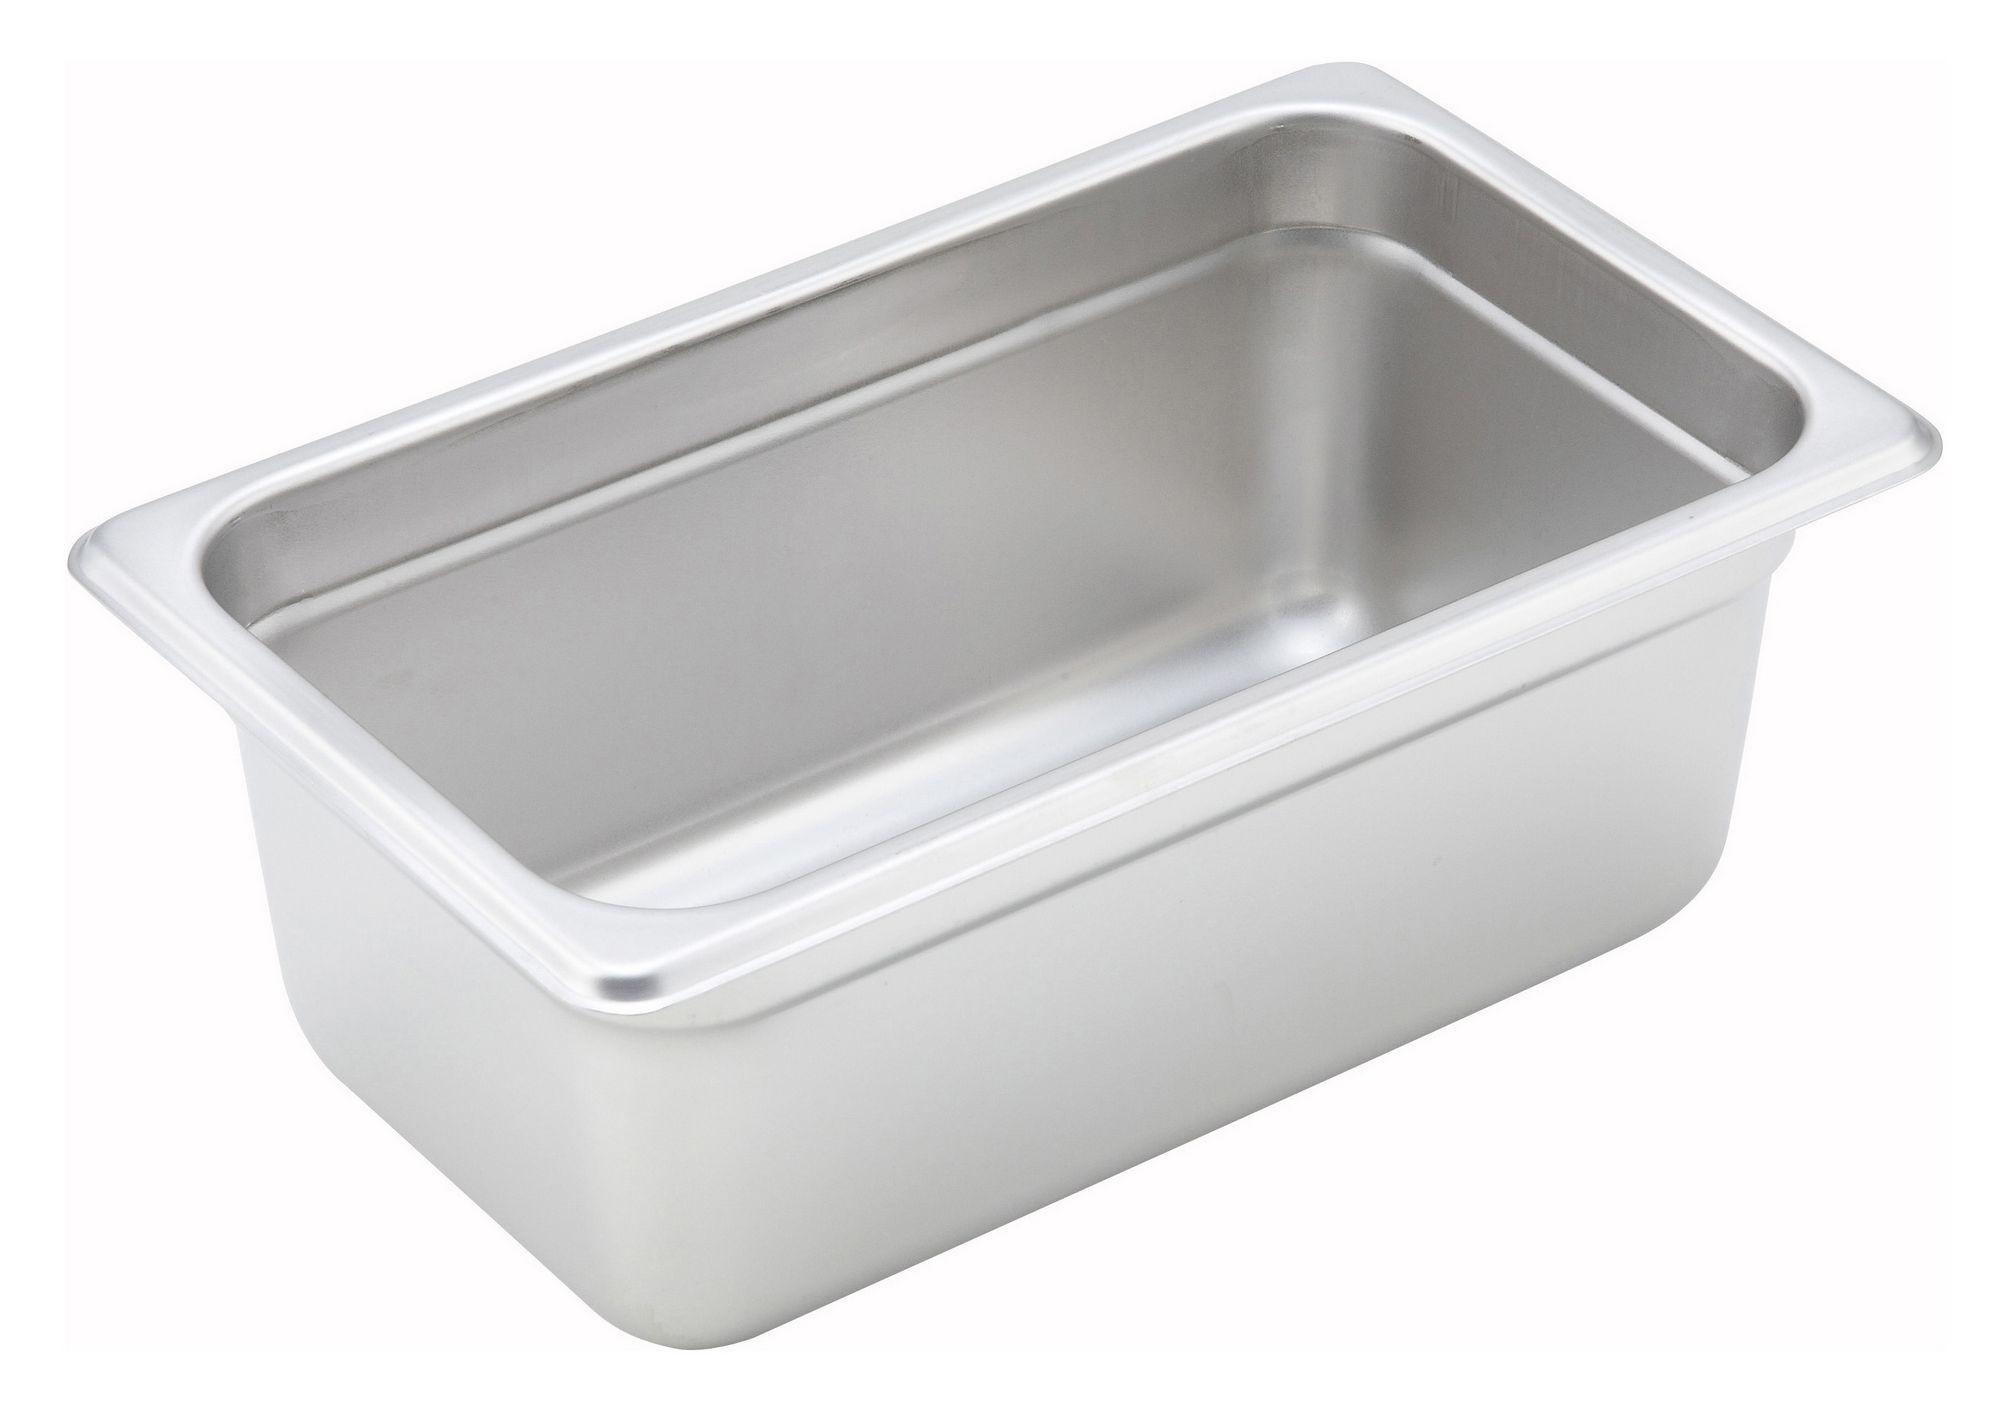 "Winco Spjh-404 1/4 Size Anti-Jam 22 Gauge Steam Table Pan 4"" Deep"